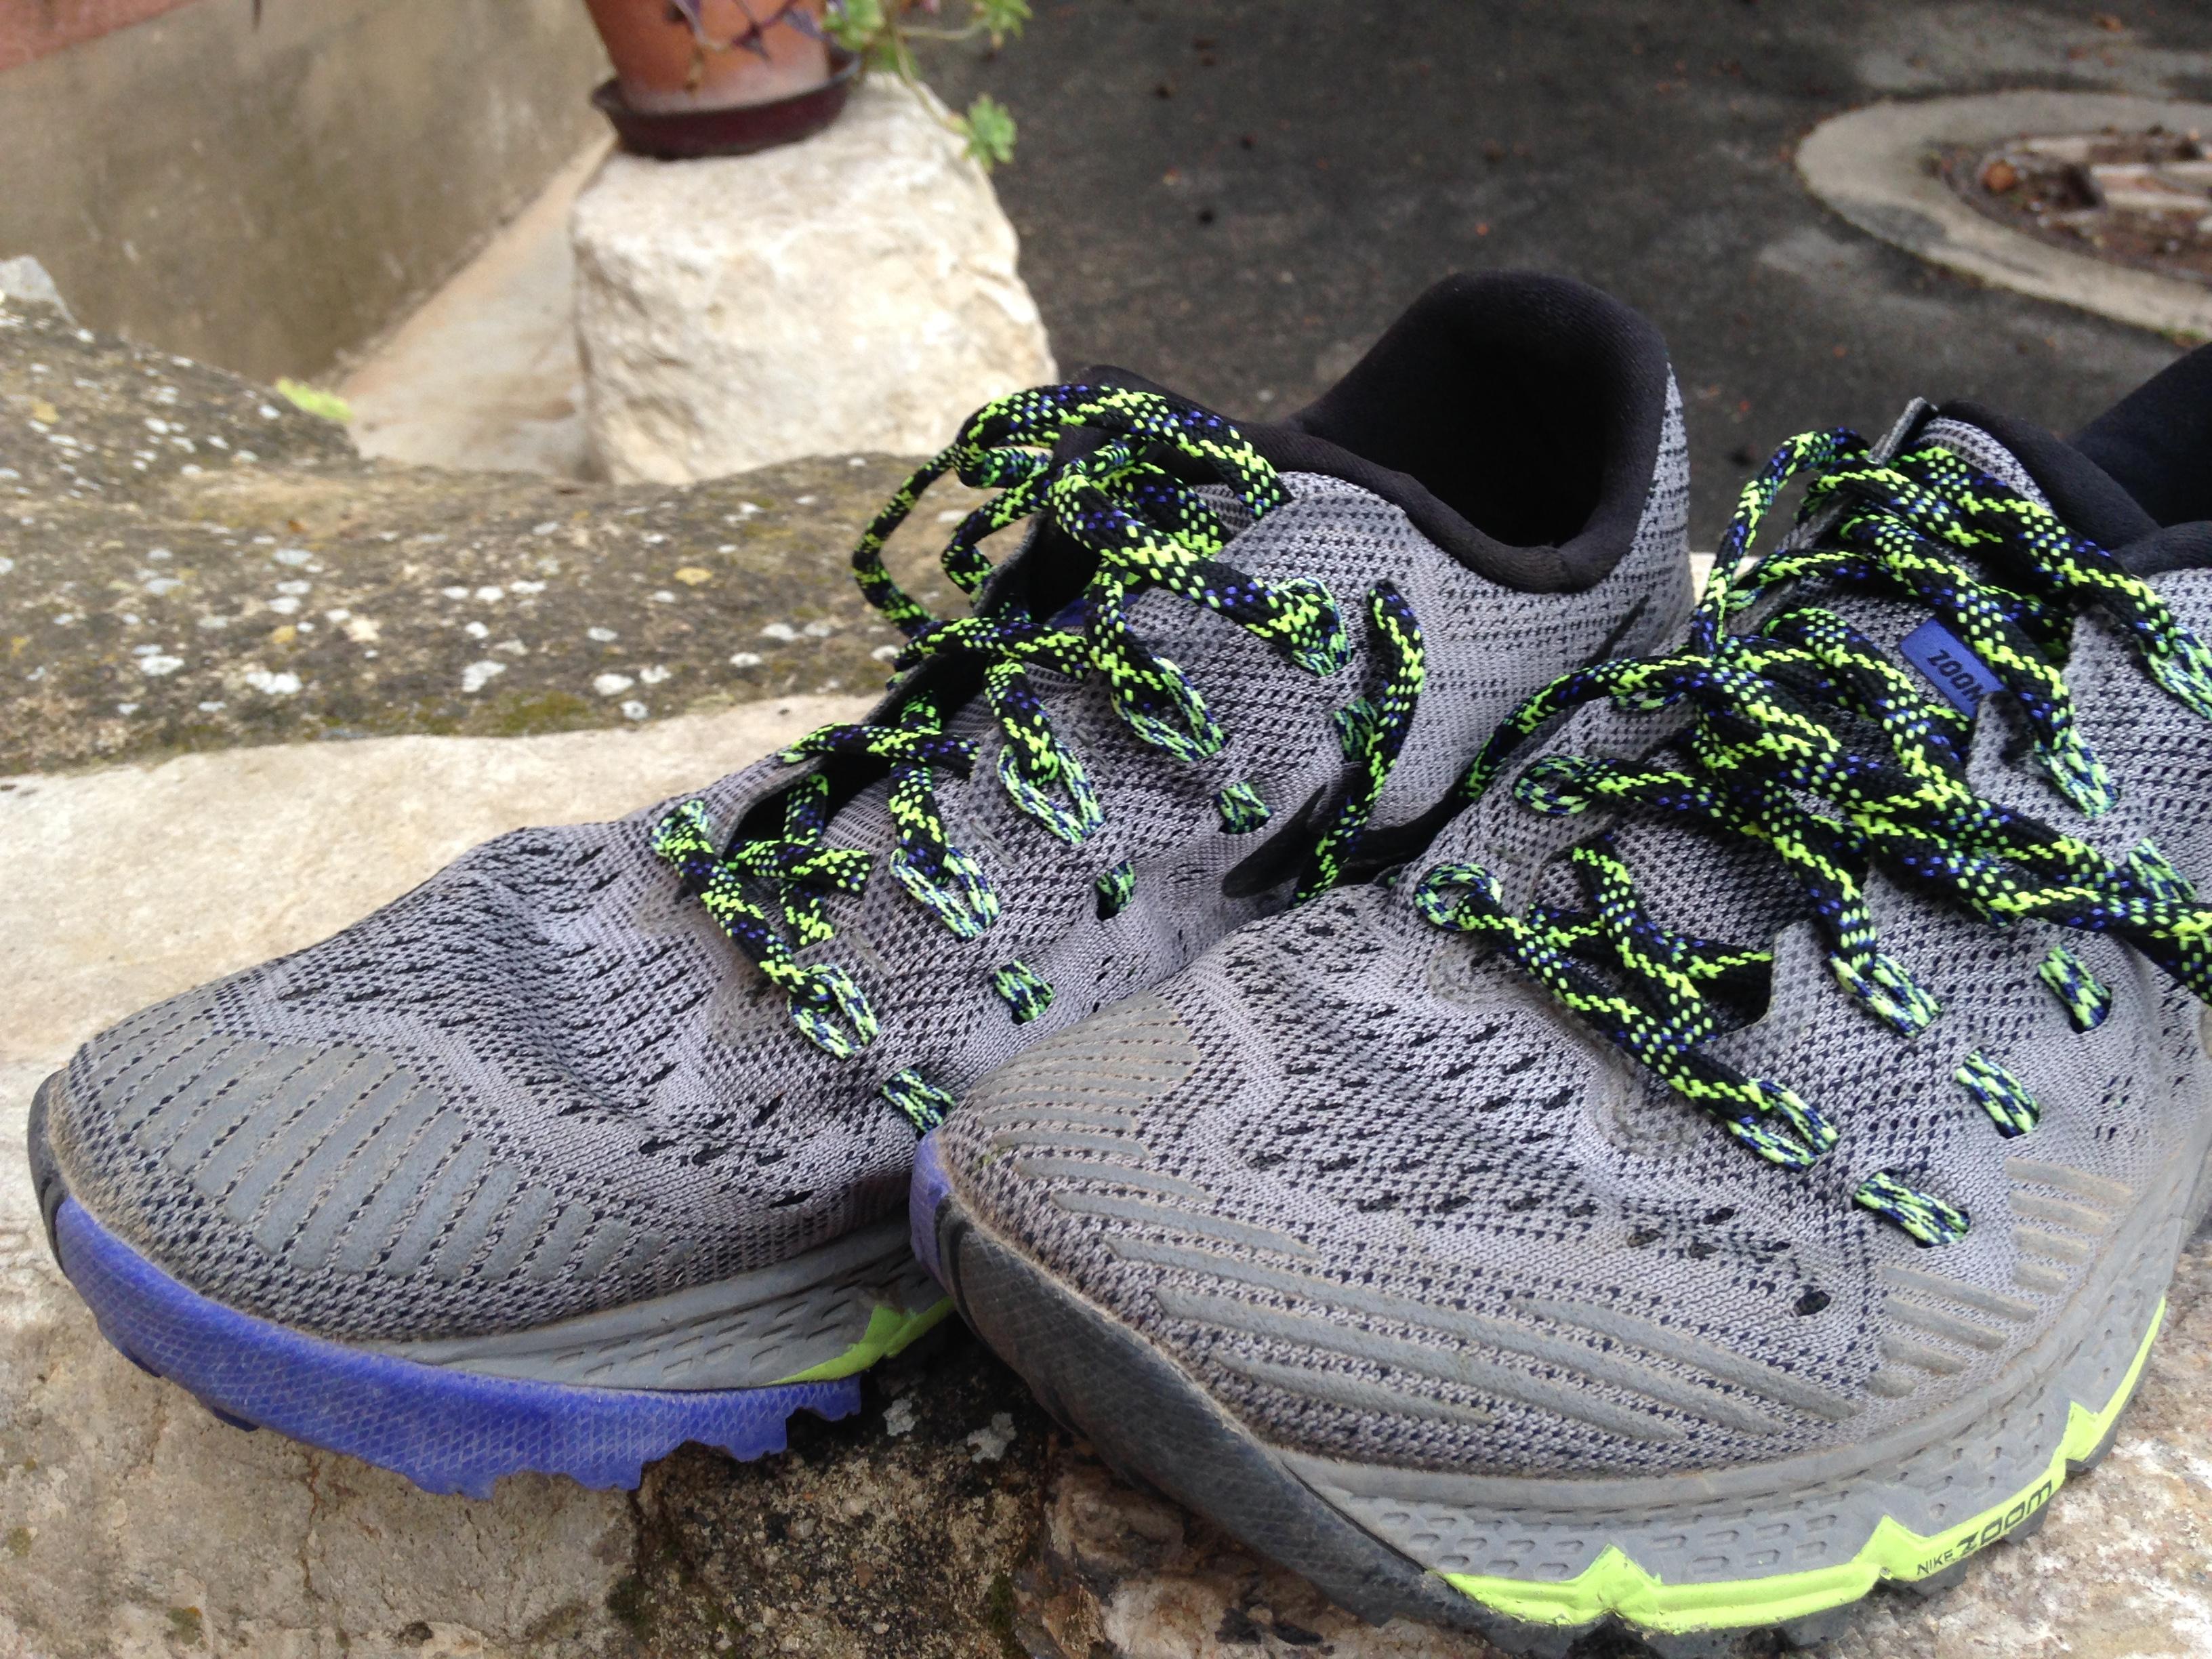 trono término análogo En todo el mundo  Test : la chaussure de trail Nike Zoom Terra Kiger 3 - U Run